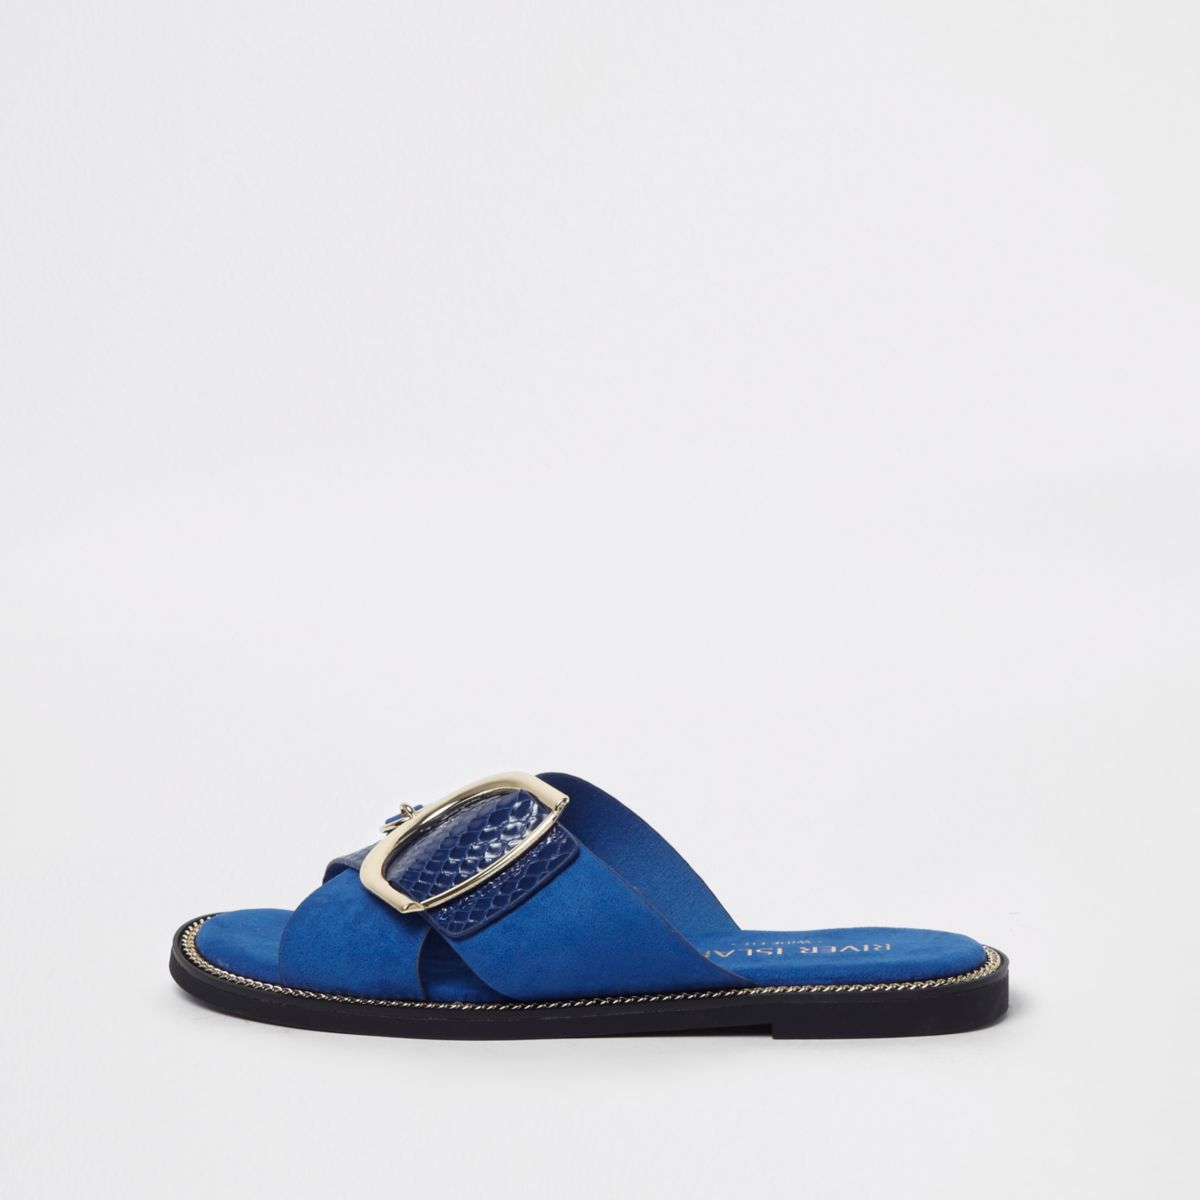 Blue croc gold tone buckle mules